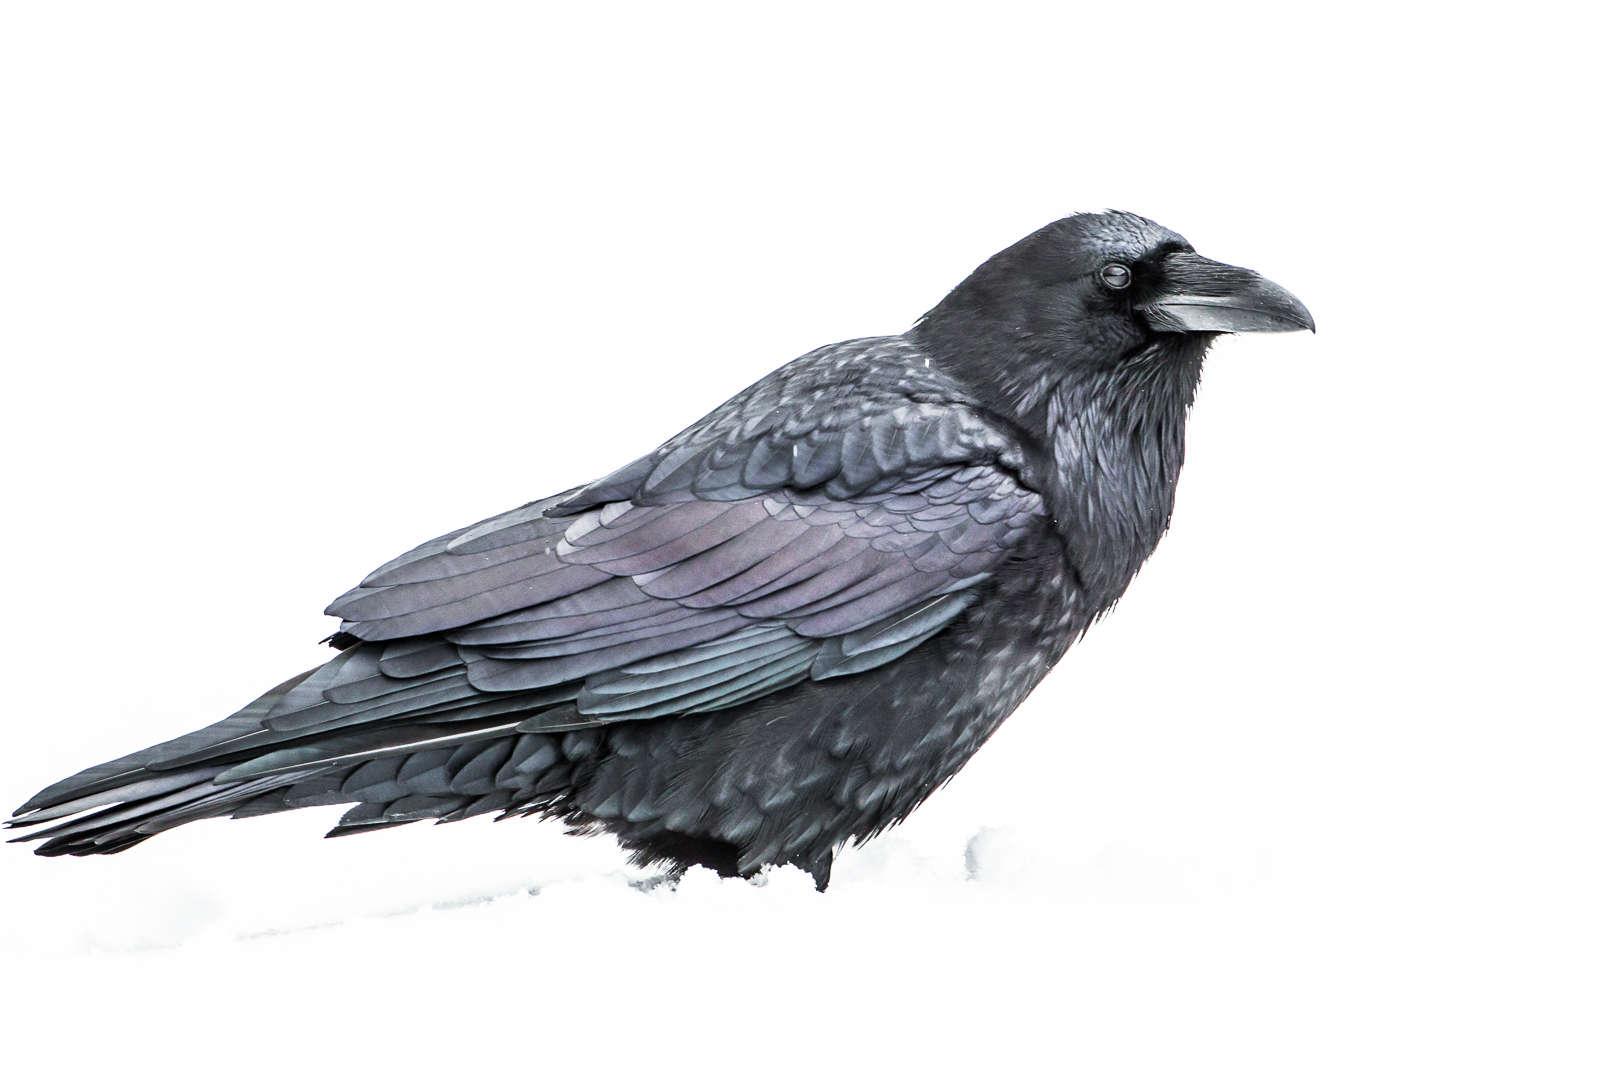 Drawn raven snow Christopher snow Photography Ravens The